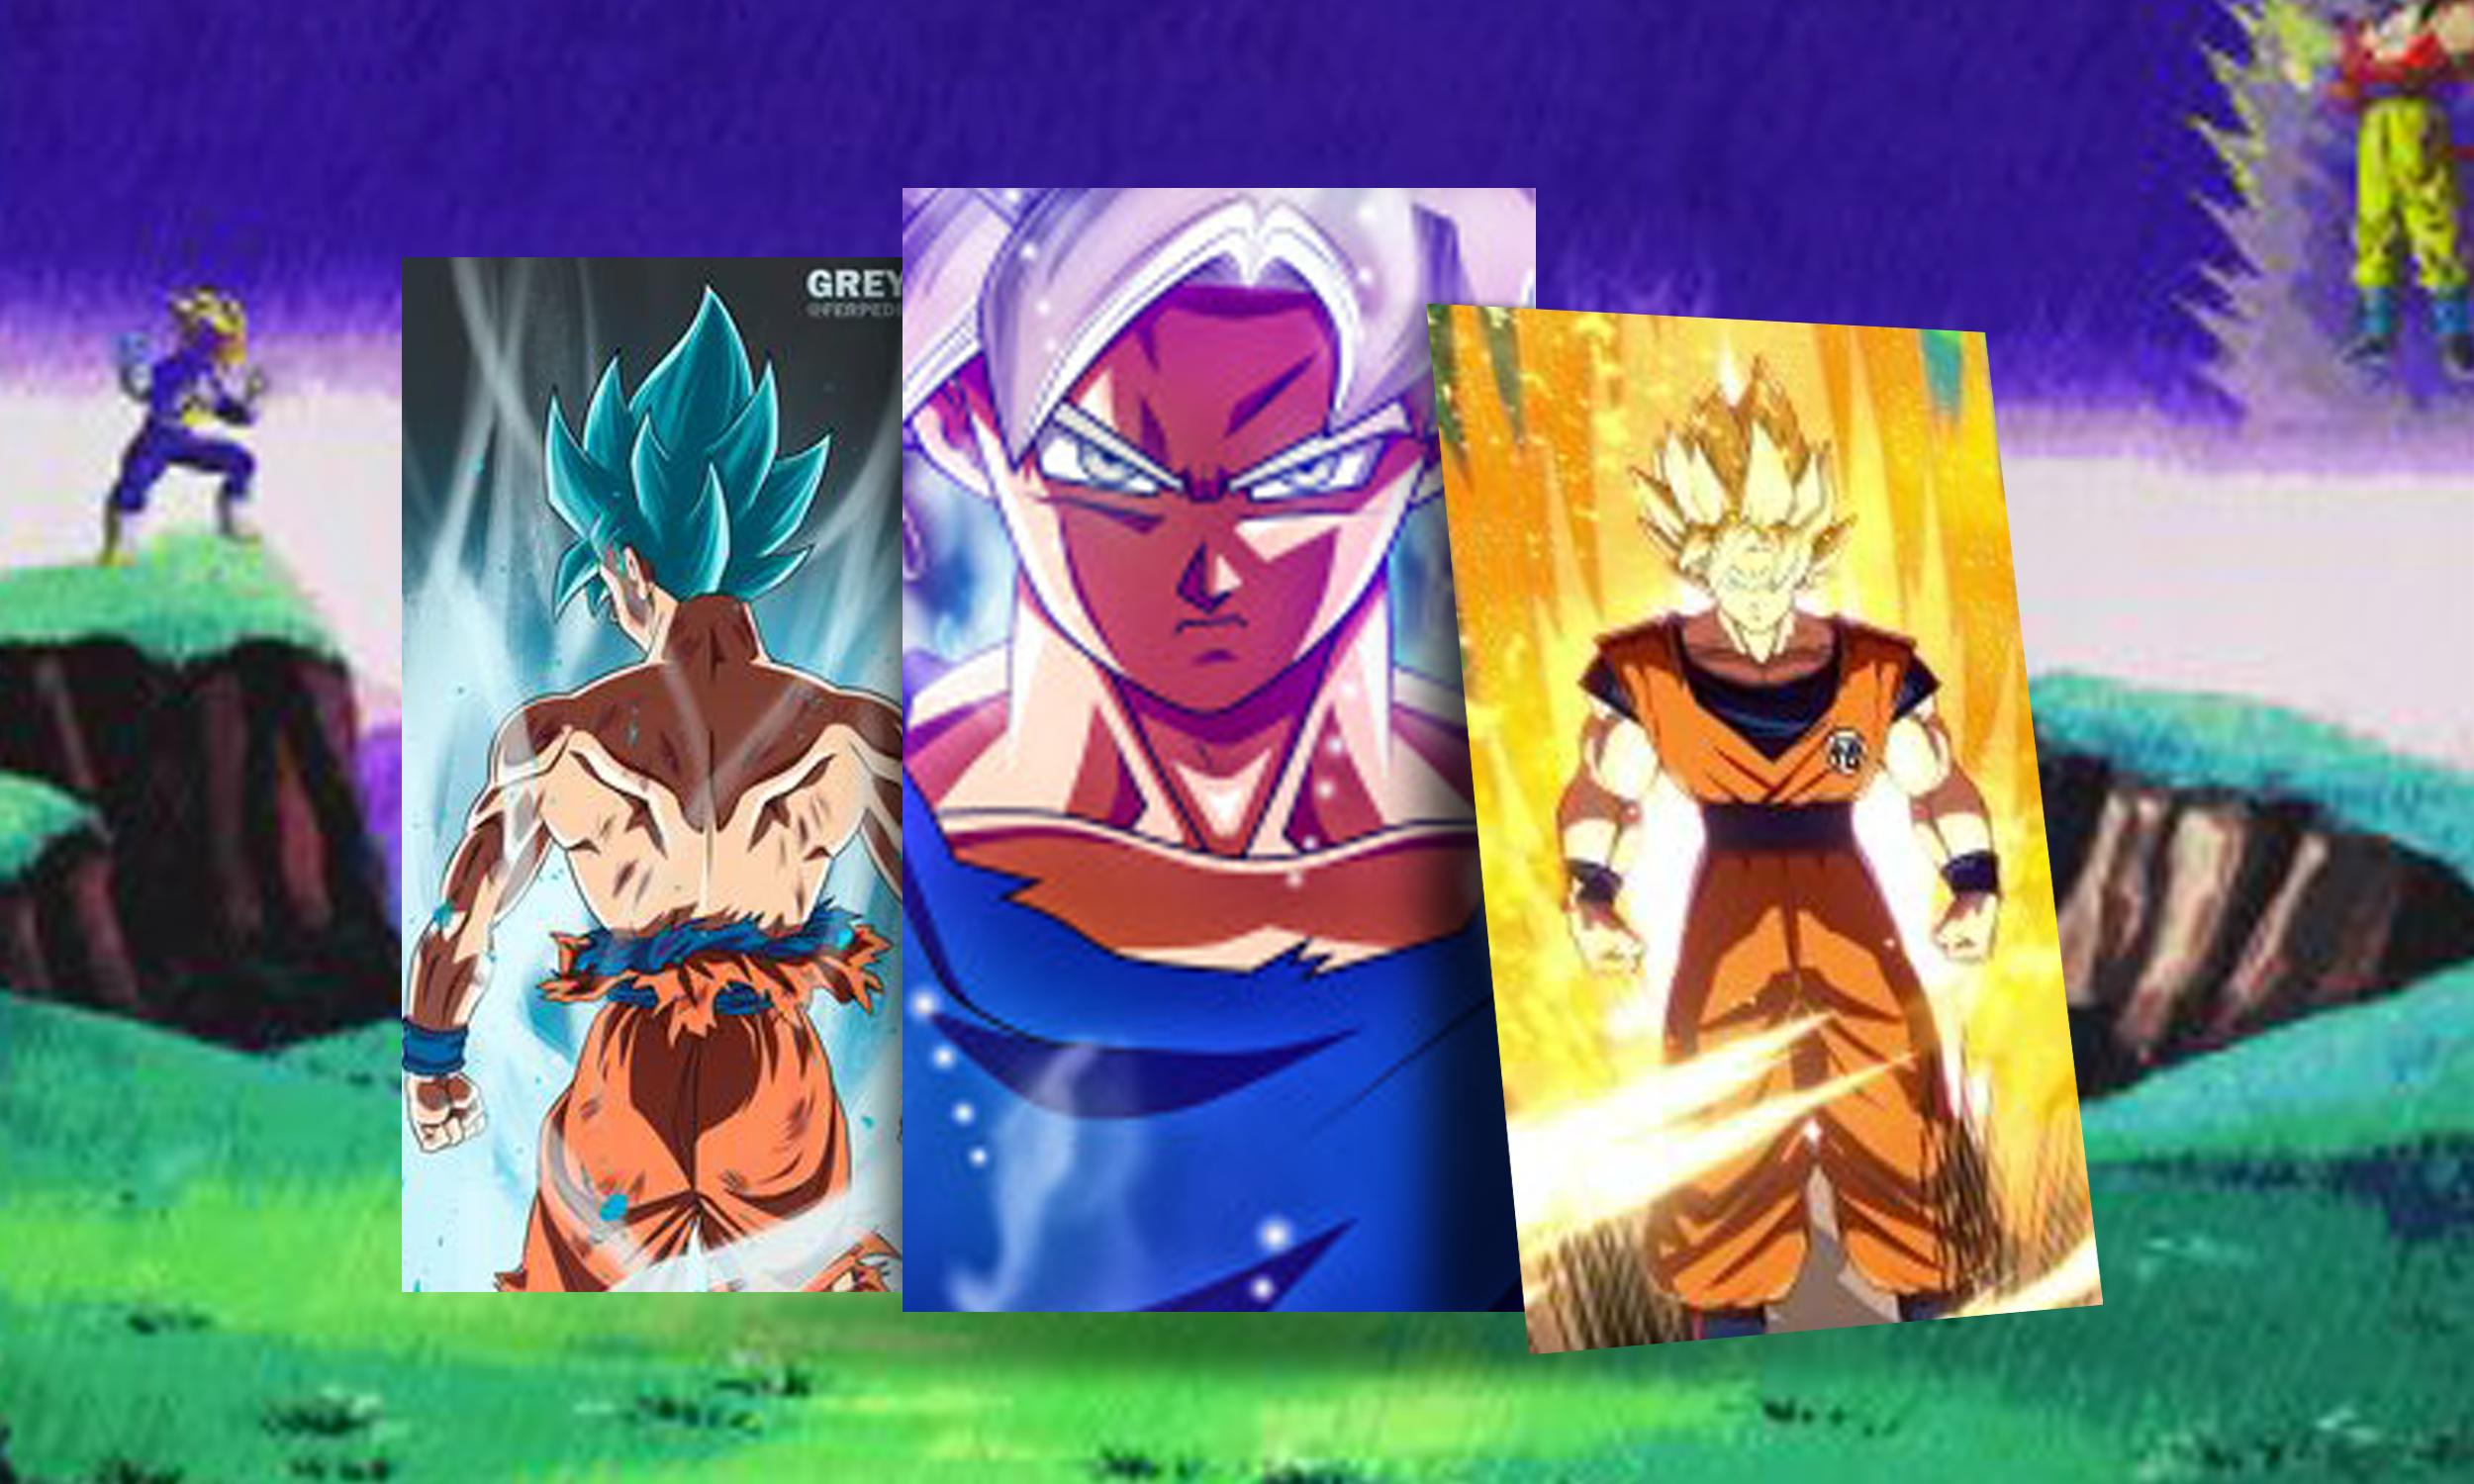 Goku Super Saiyan Wallpapers For Android Apk Download